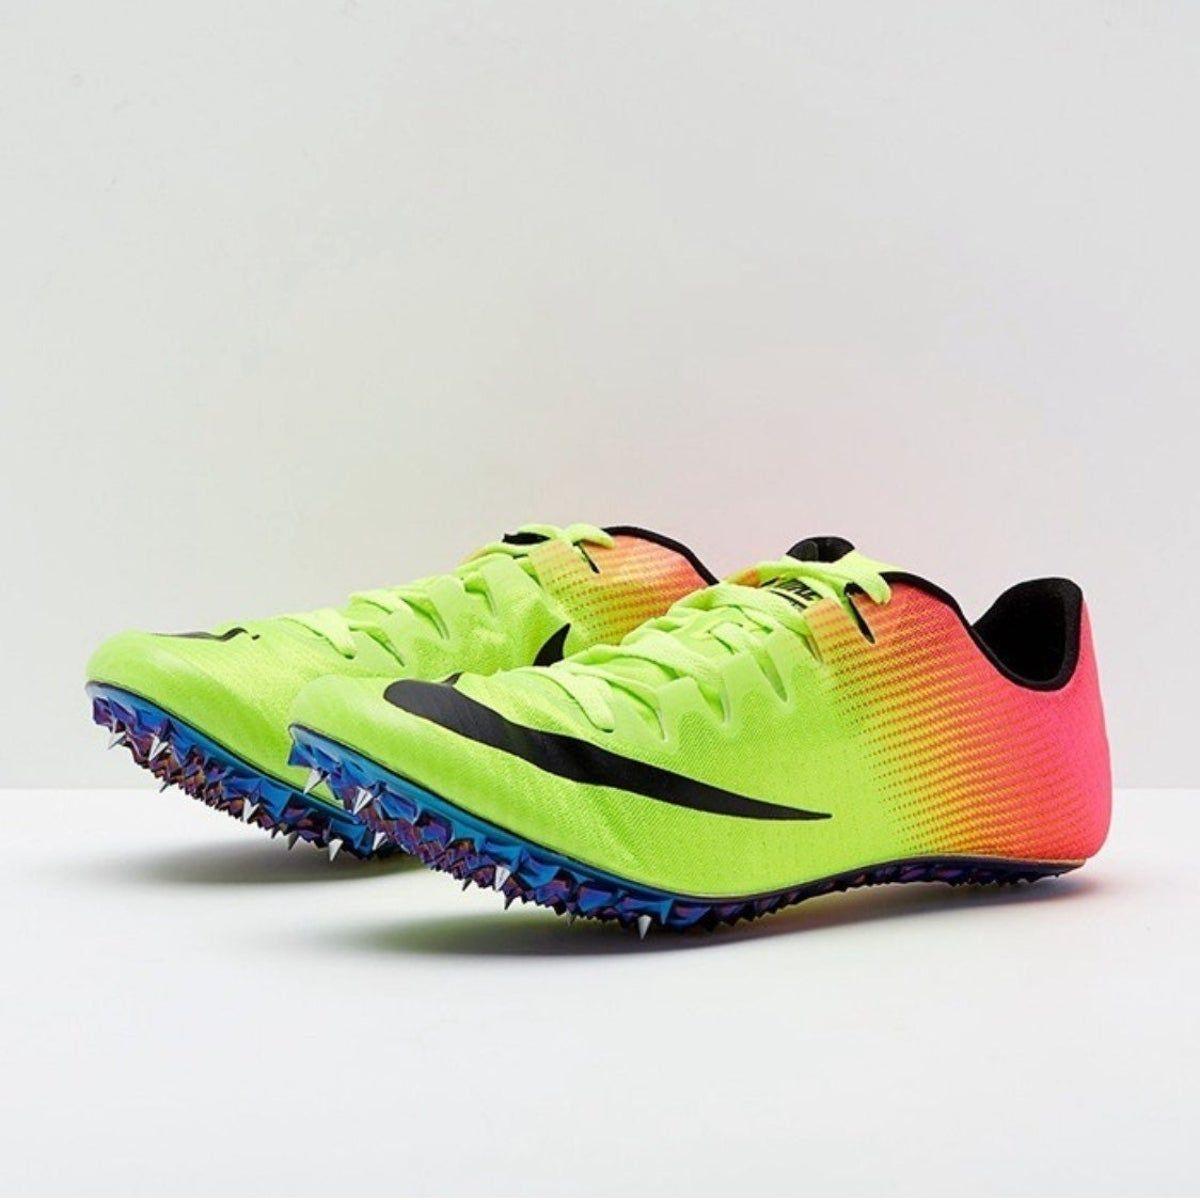 Nike Zoom Superfly Elite Sprint Spikes